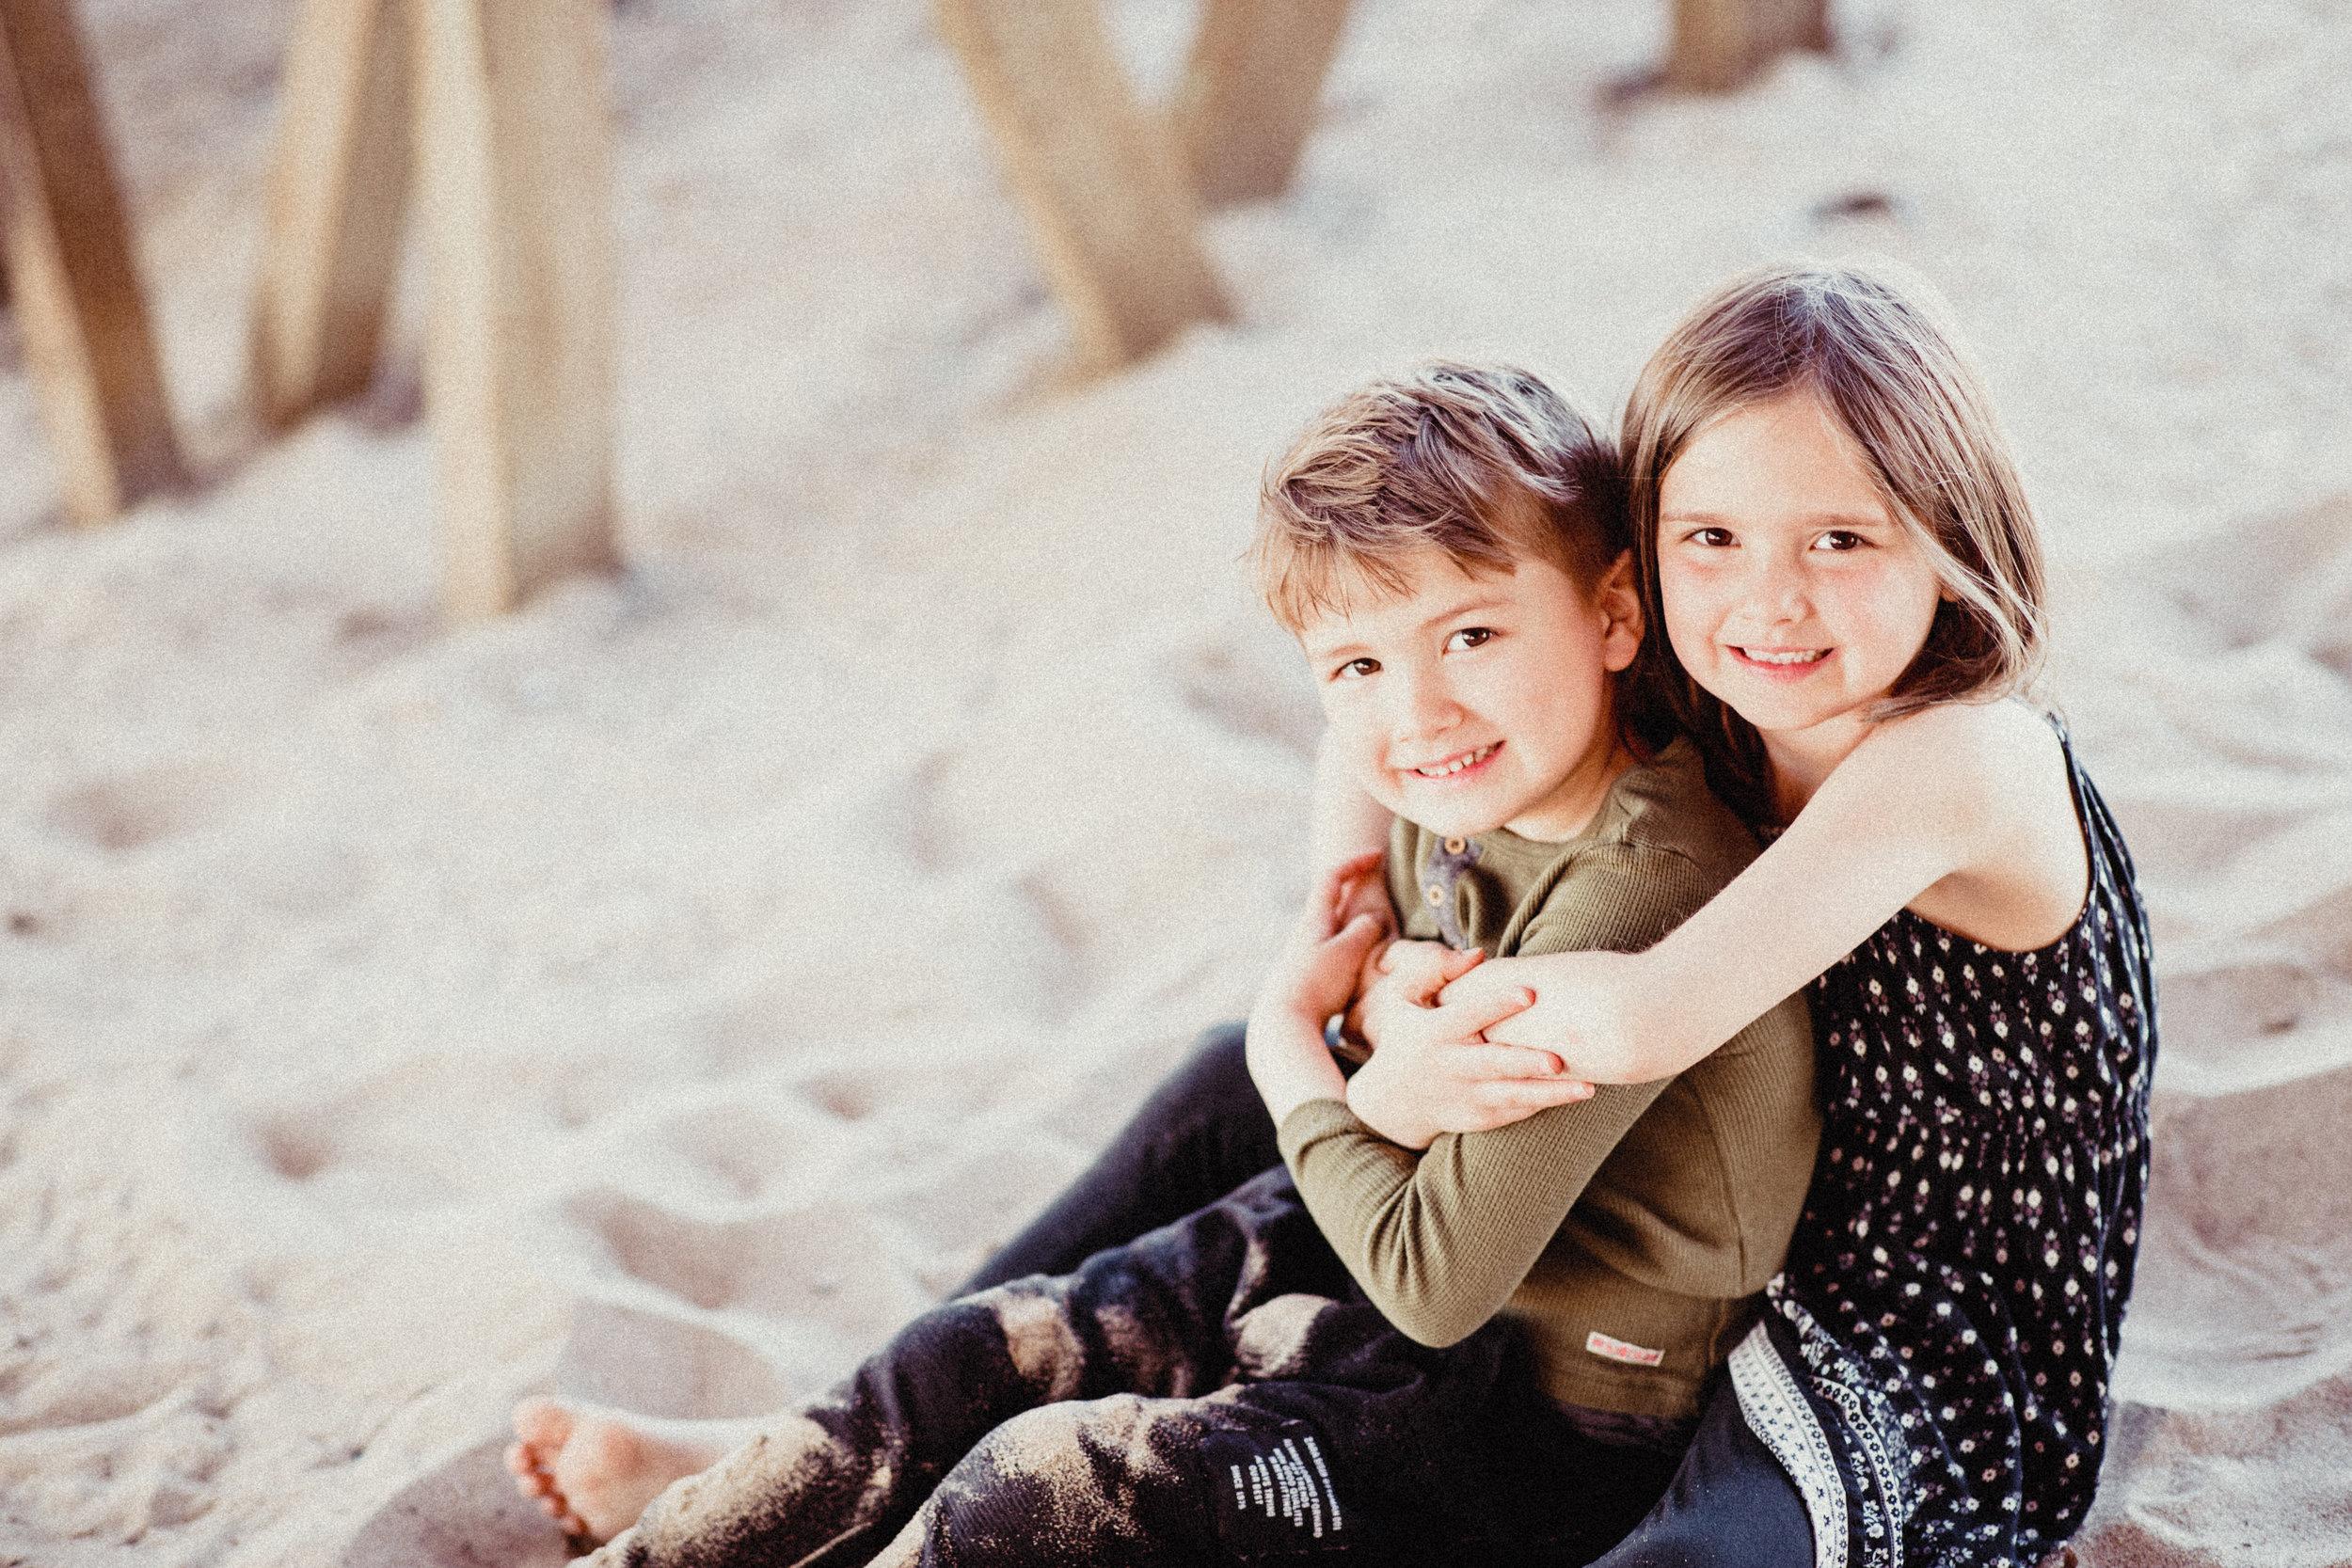 la manhatten beach photo shooting family portraits04.jpeg